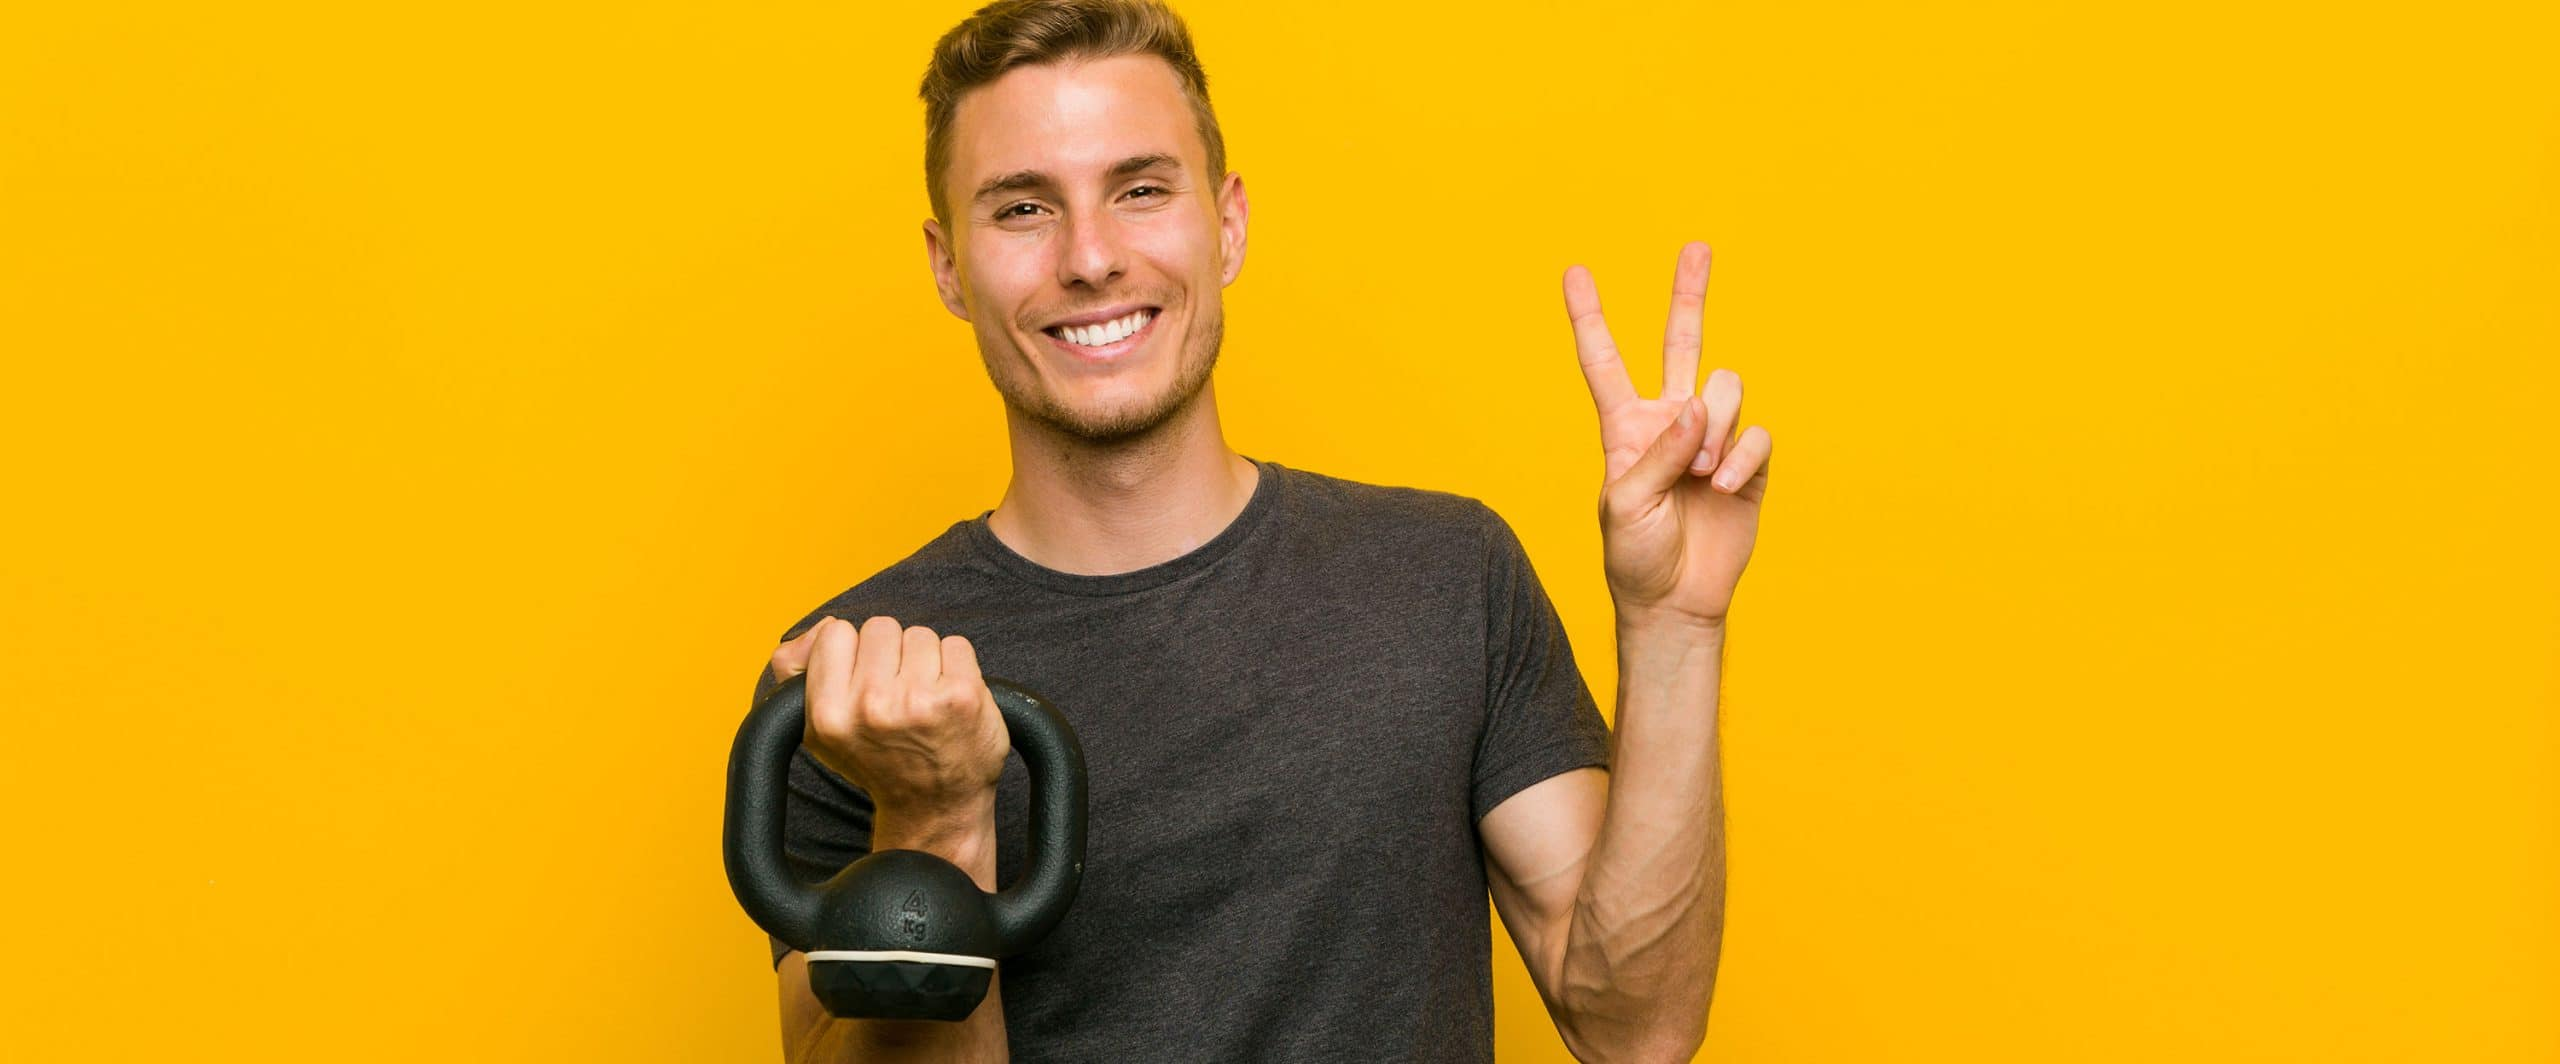 Angebot Fitnessstudio 2 Studios 1 Preis in Limburg